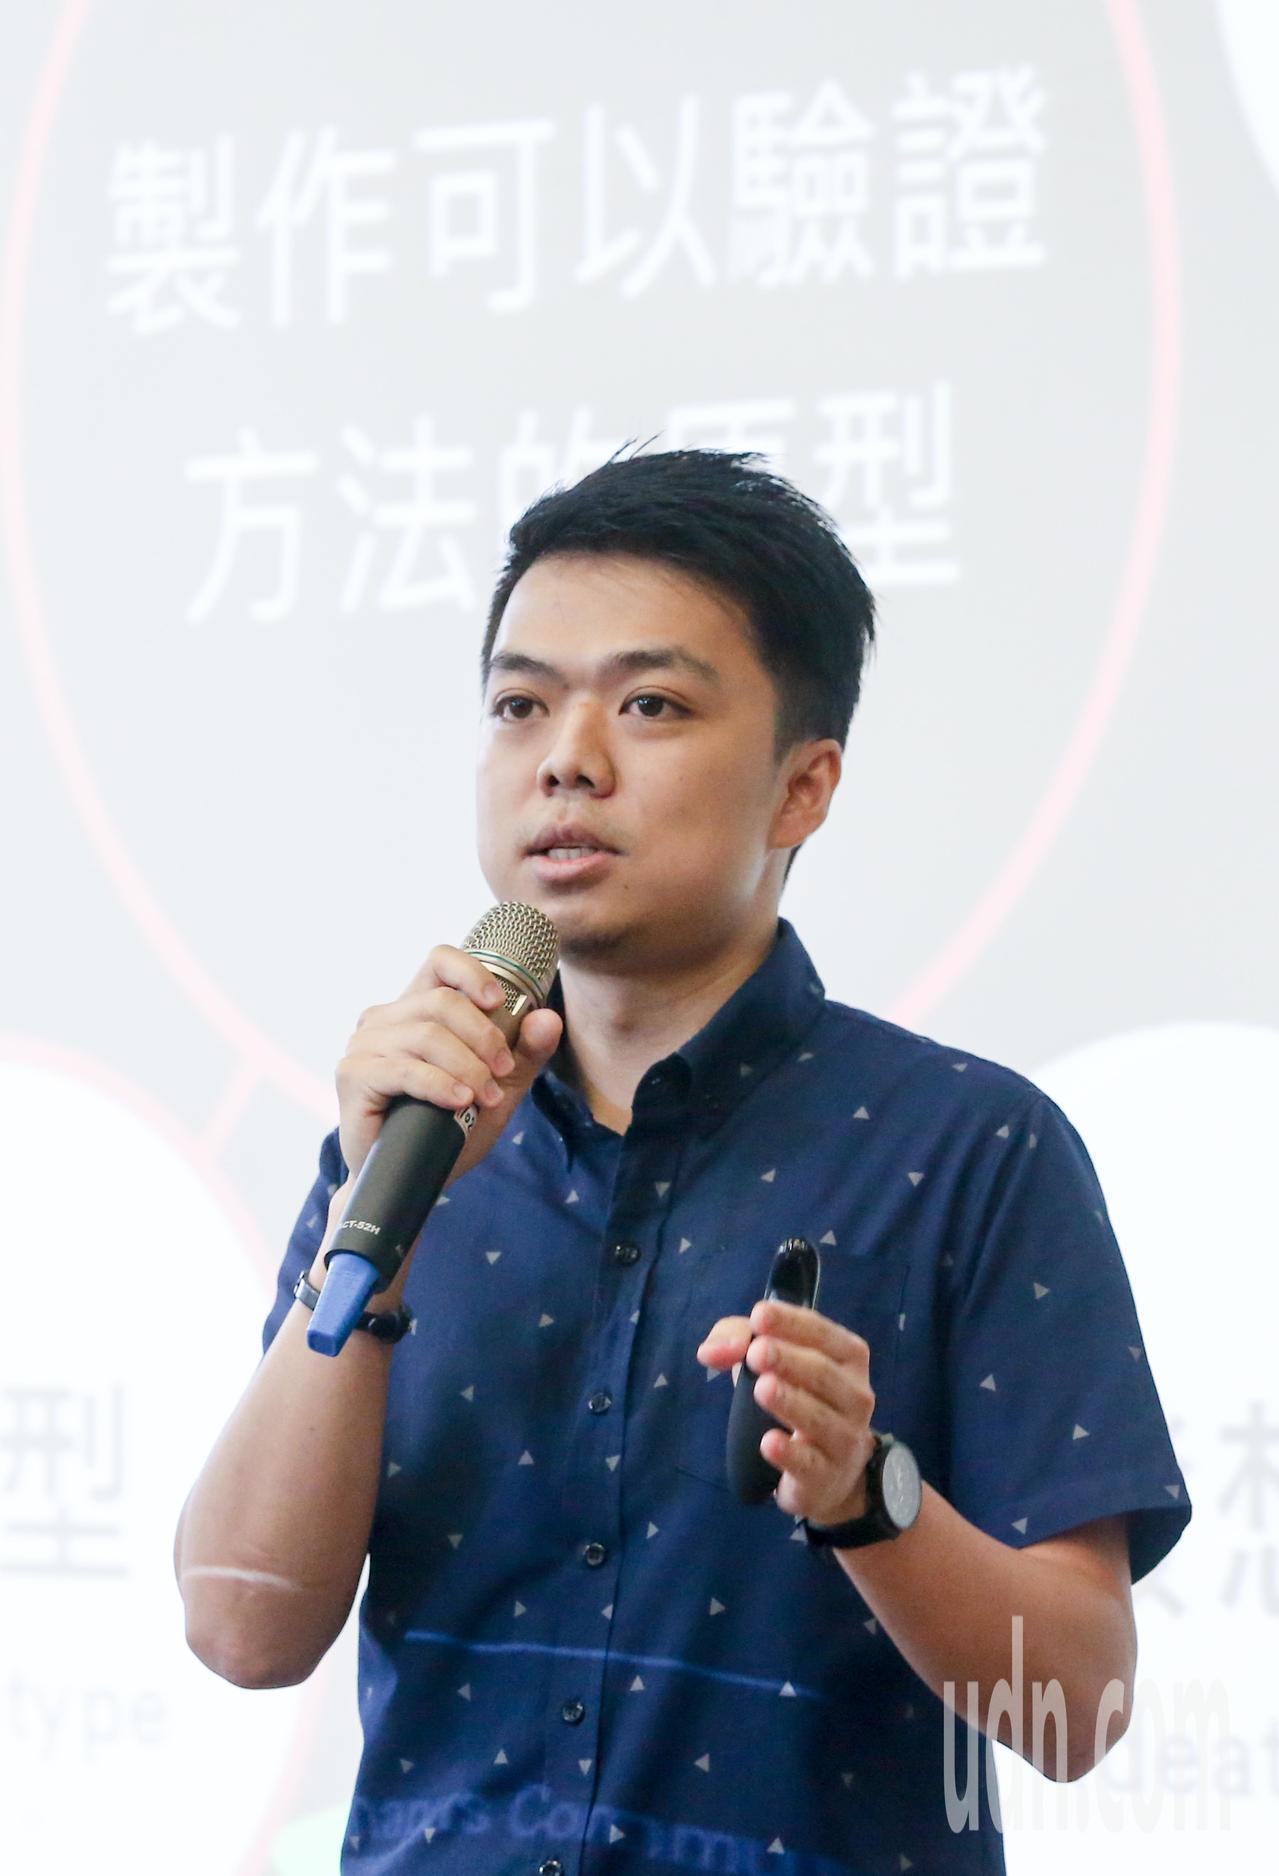 pebbo履行總監林志勳以「從思慮設計到設計思慮」為題揭橥演講。記者鄭清元/攝影